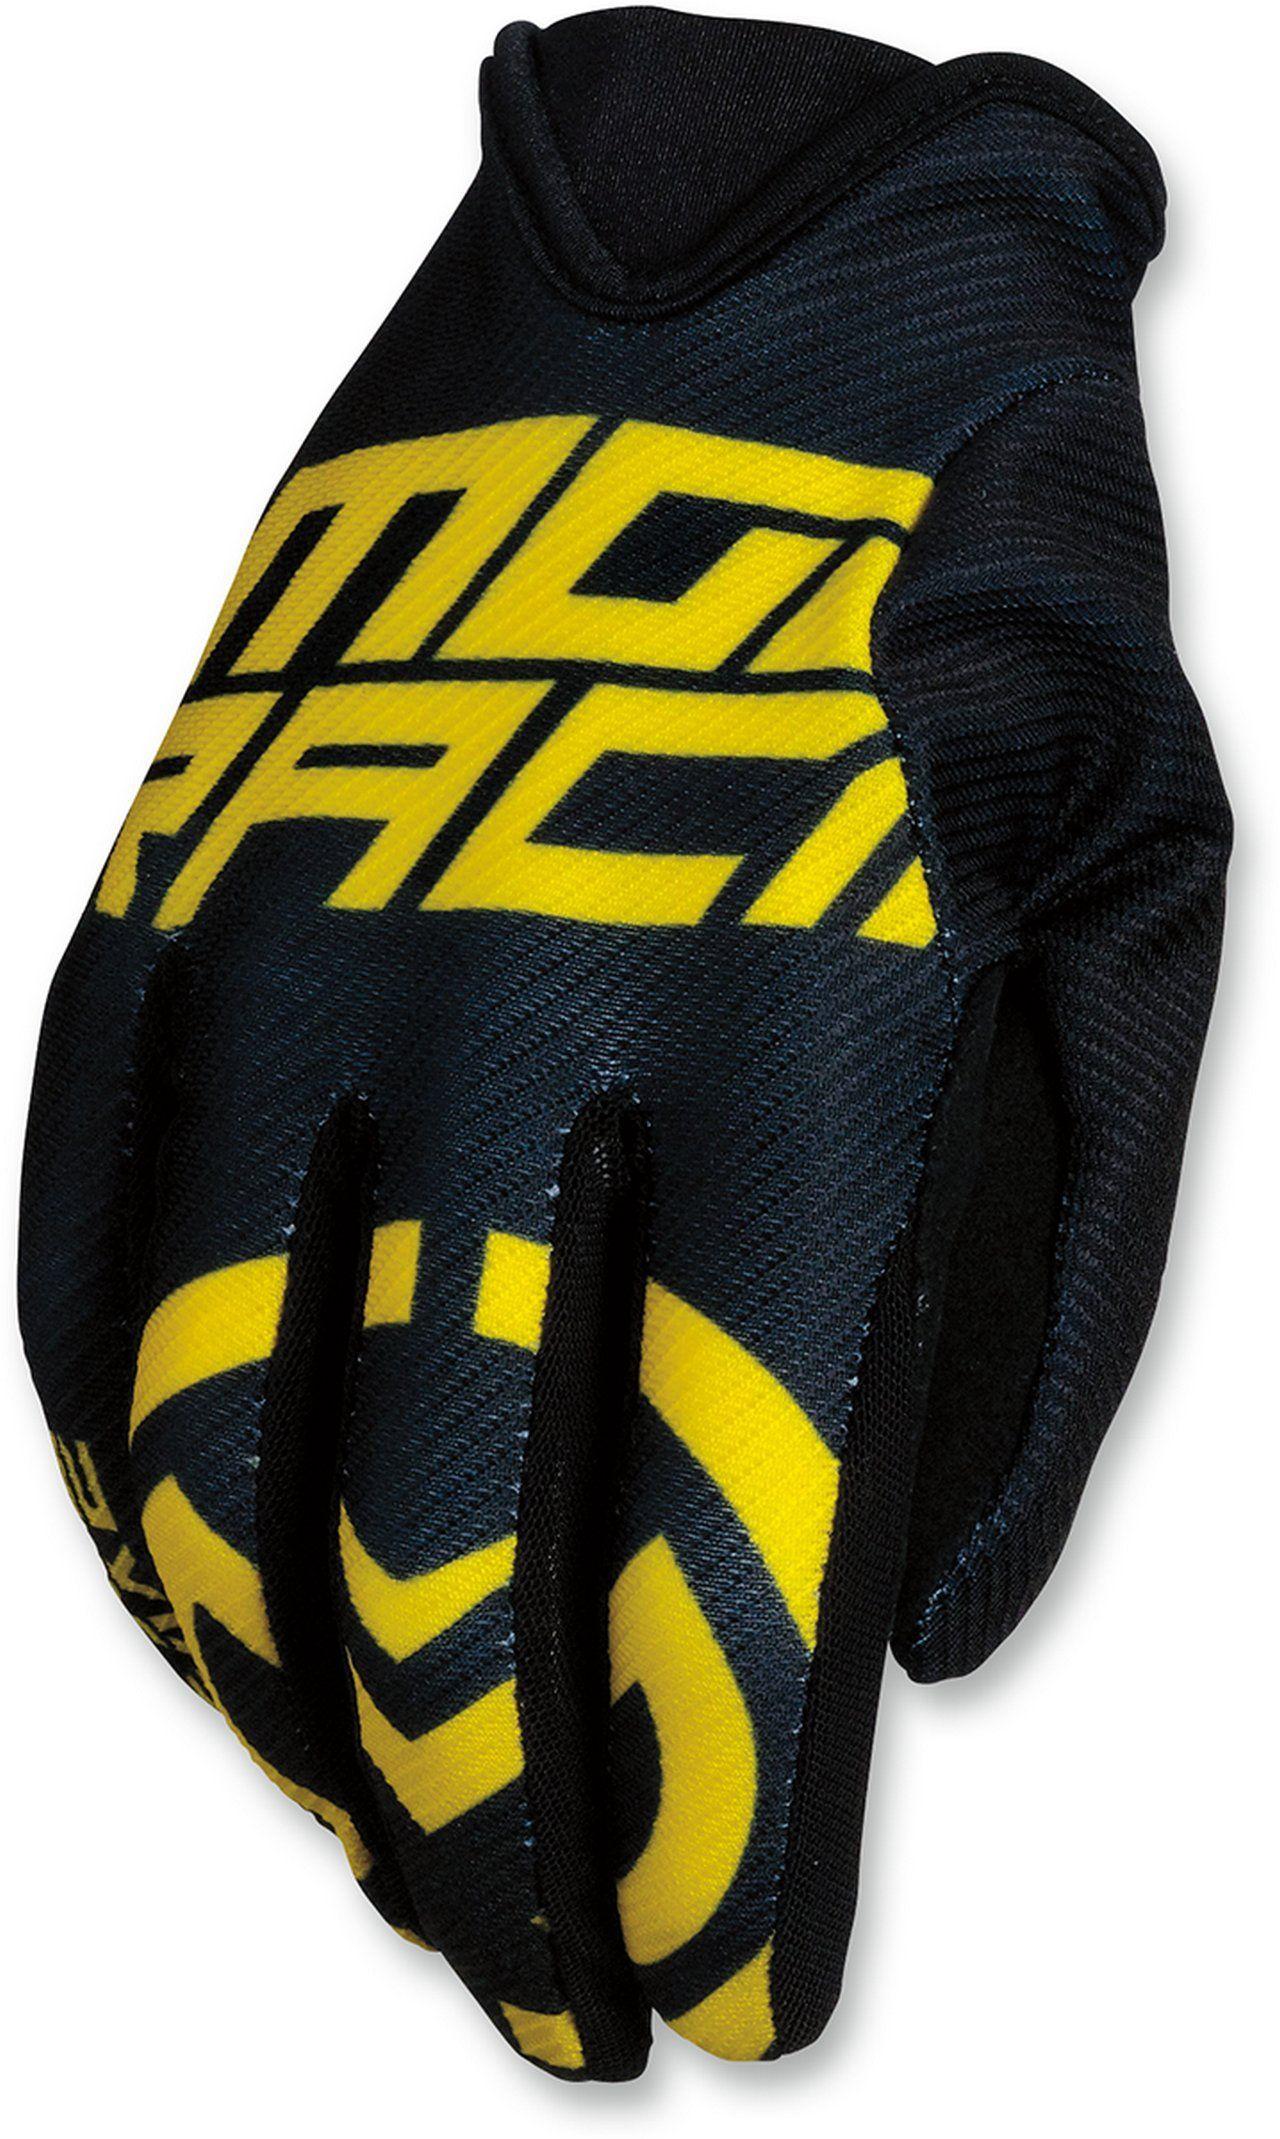 【MOOSE RACING】MX2 手套 [3330-4548] - 「Webike-摩托百貨」